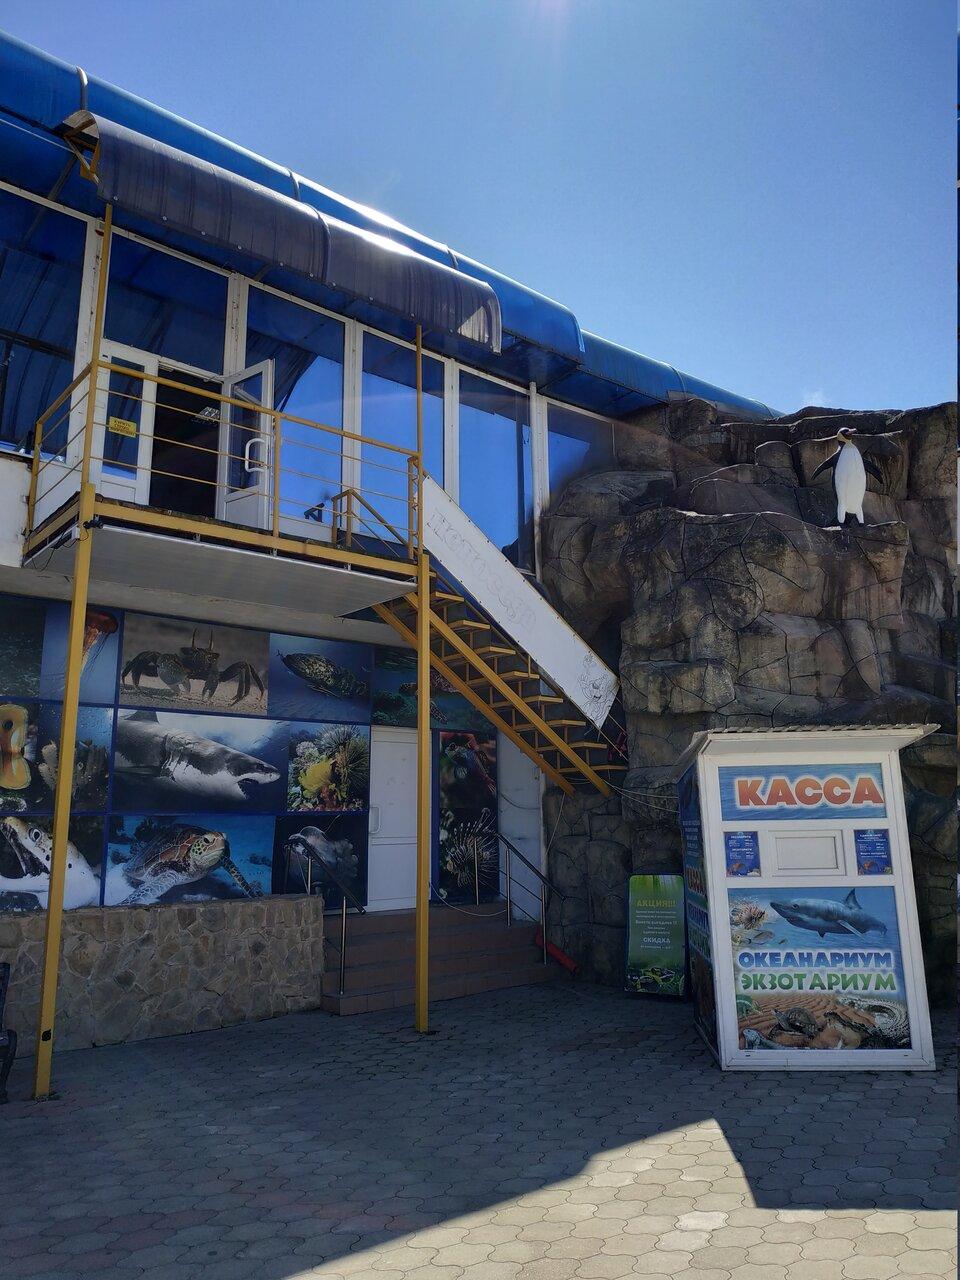 океанариум в лазаревском картинки аквапарке